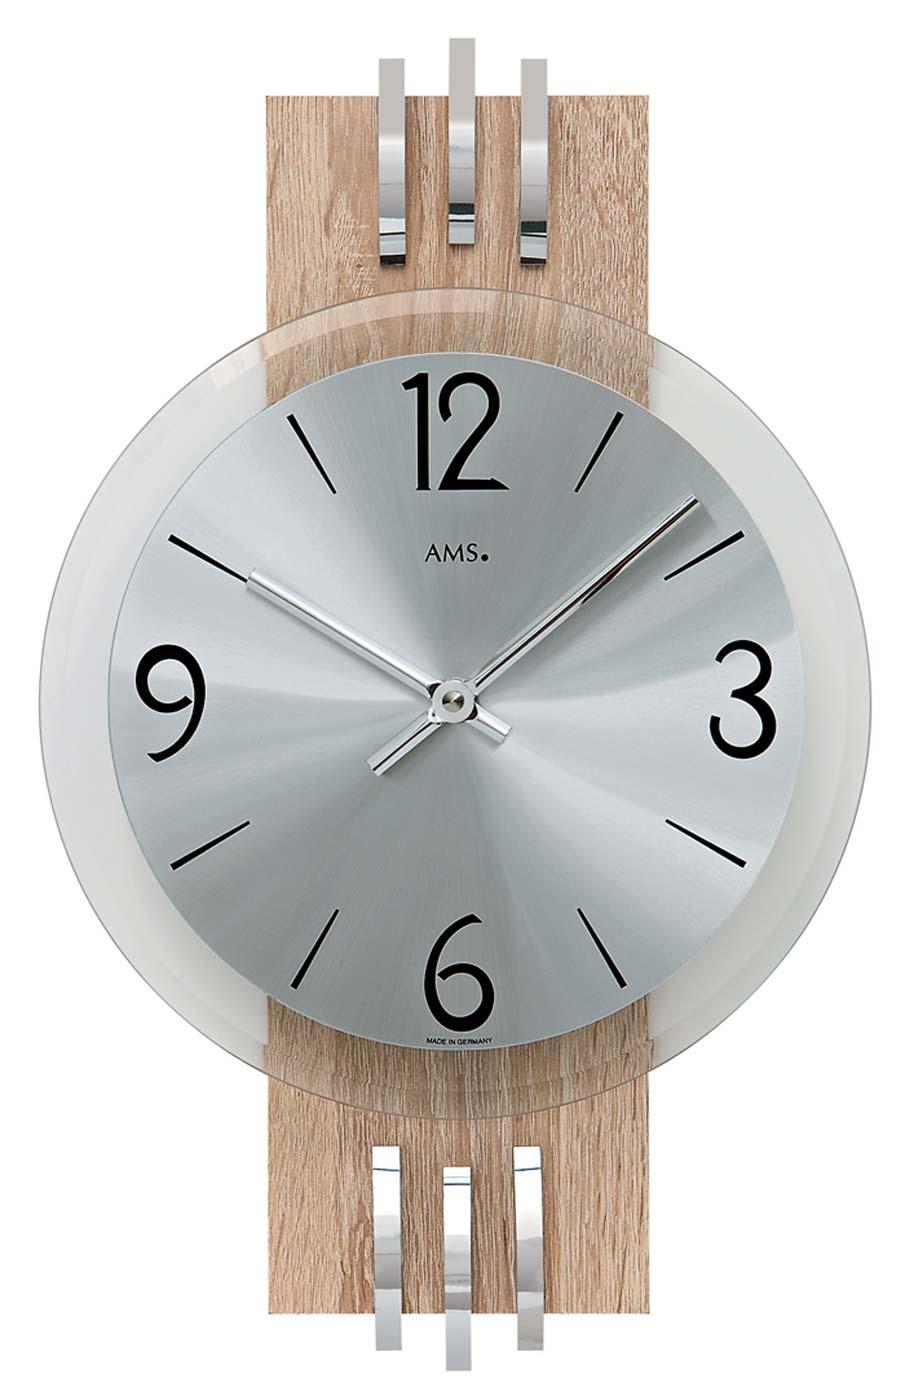 Watches | Chrono12 - AMS 9228 Wanduhr modern - Serie: AMS Wanduhren